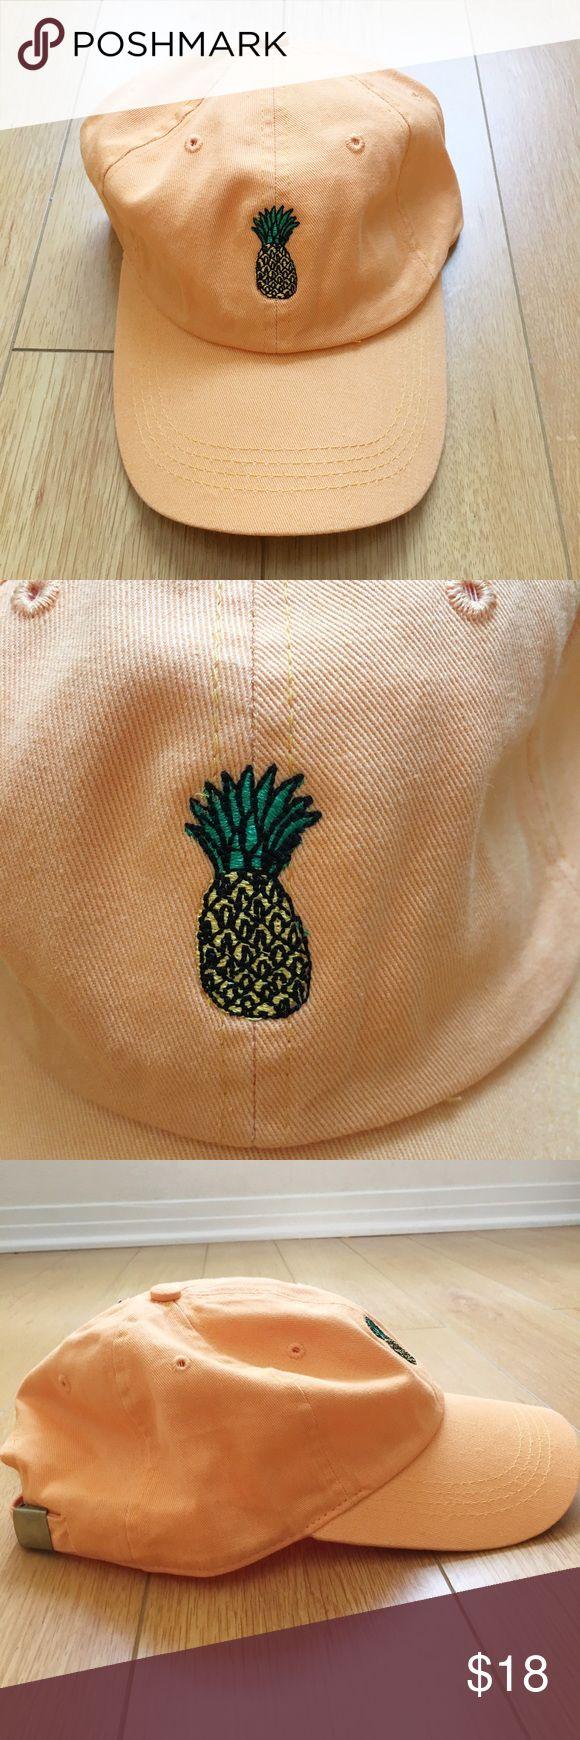 Orange Pineapple Baseball Cap Hat Nwt